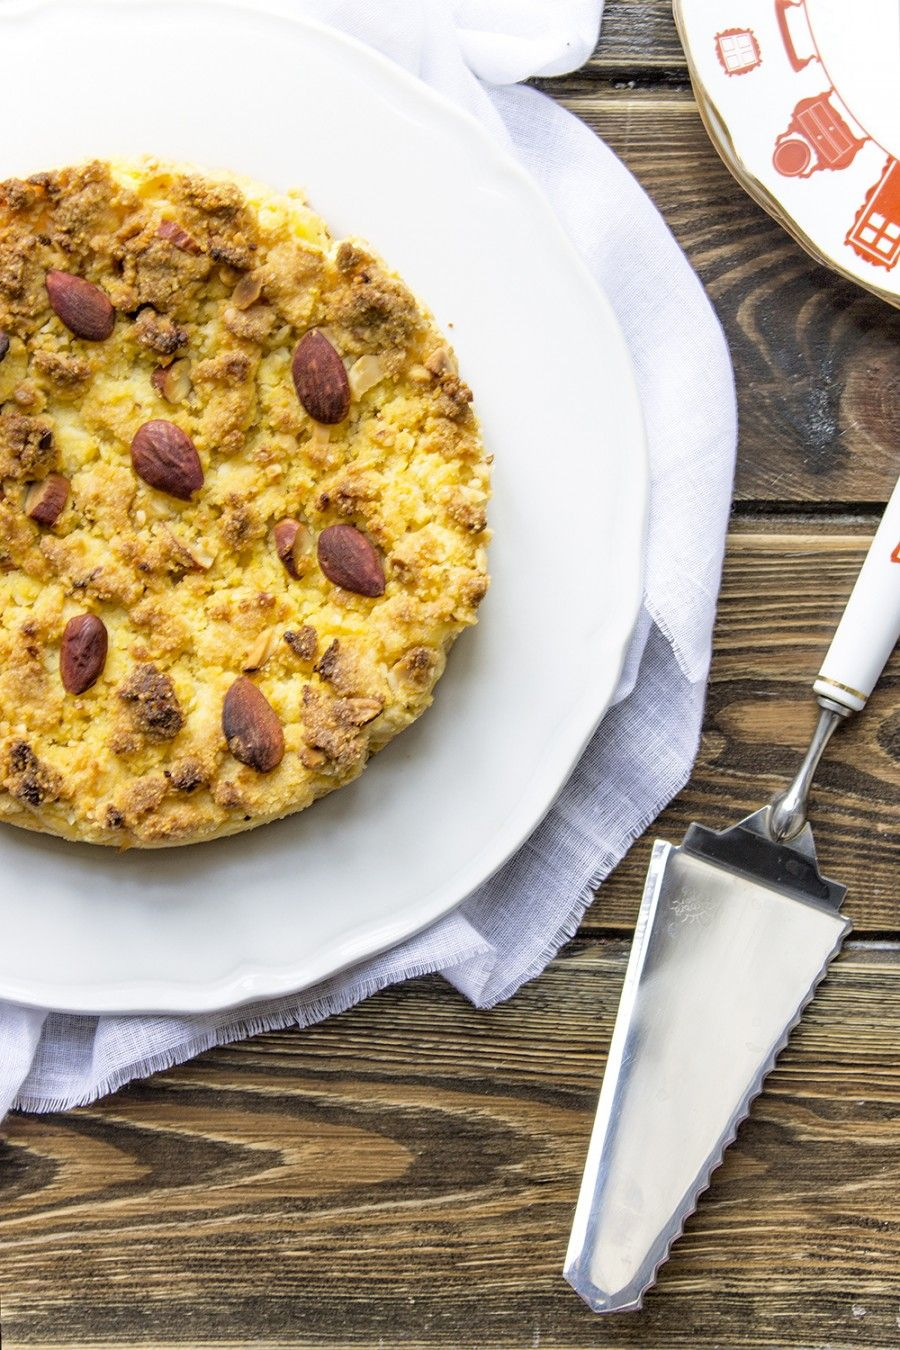 sbrisolona-contemporaneo-food